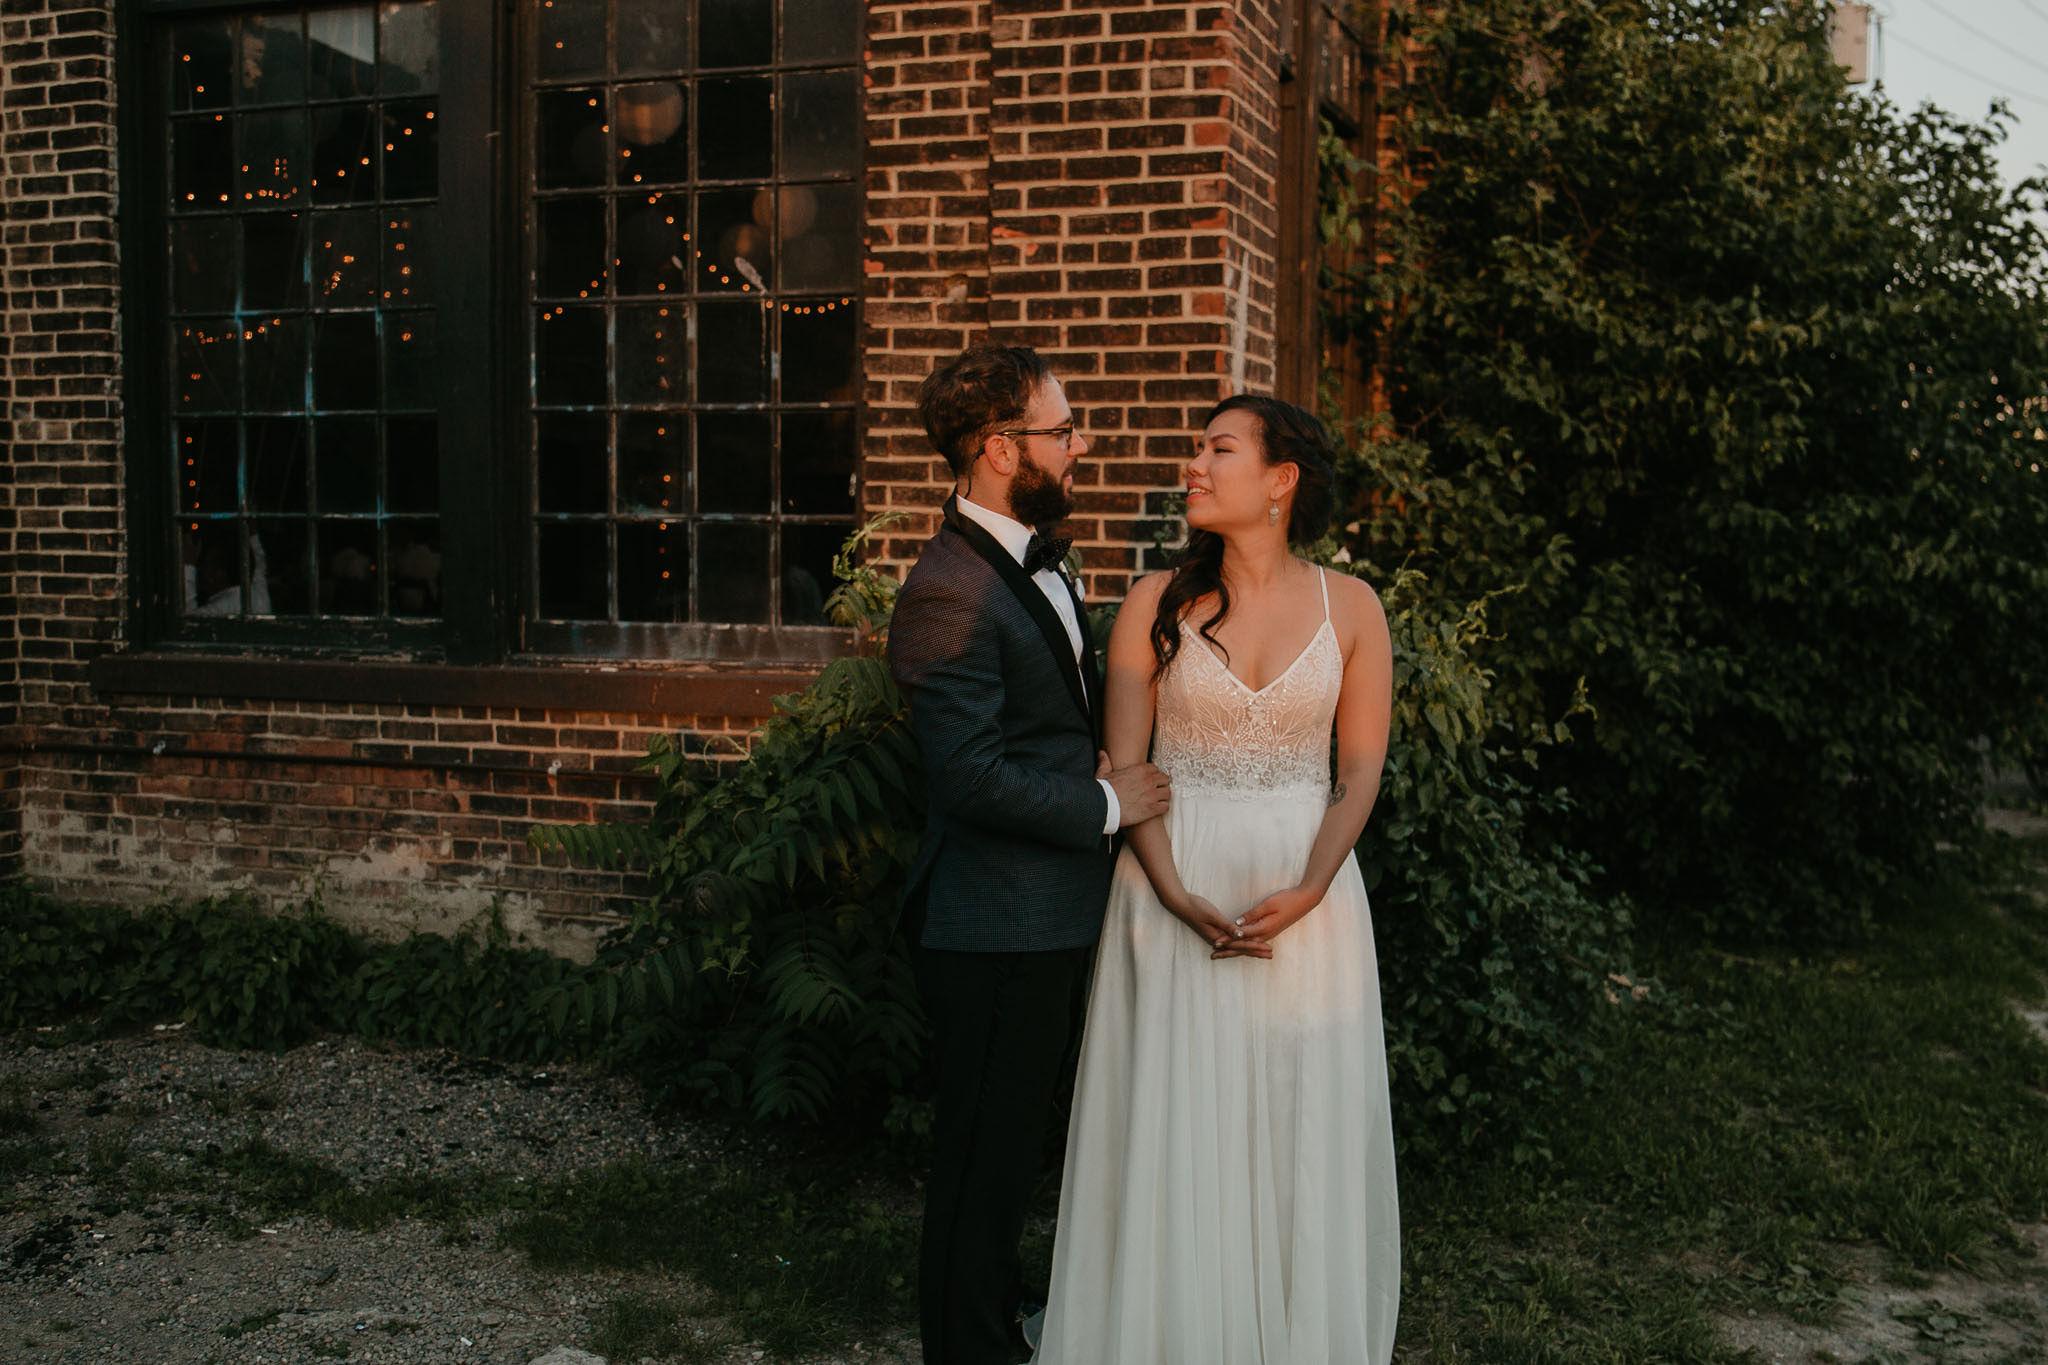 Jess+Matt_wedding-408.JPG